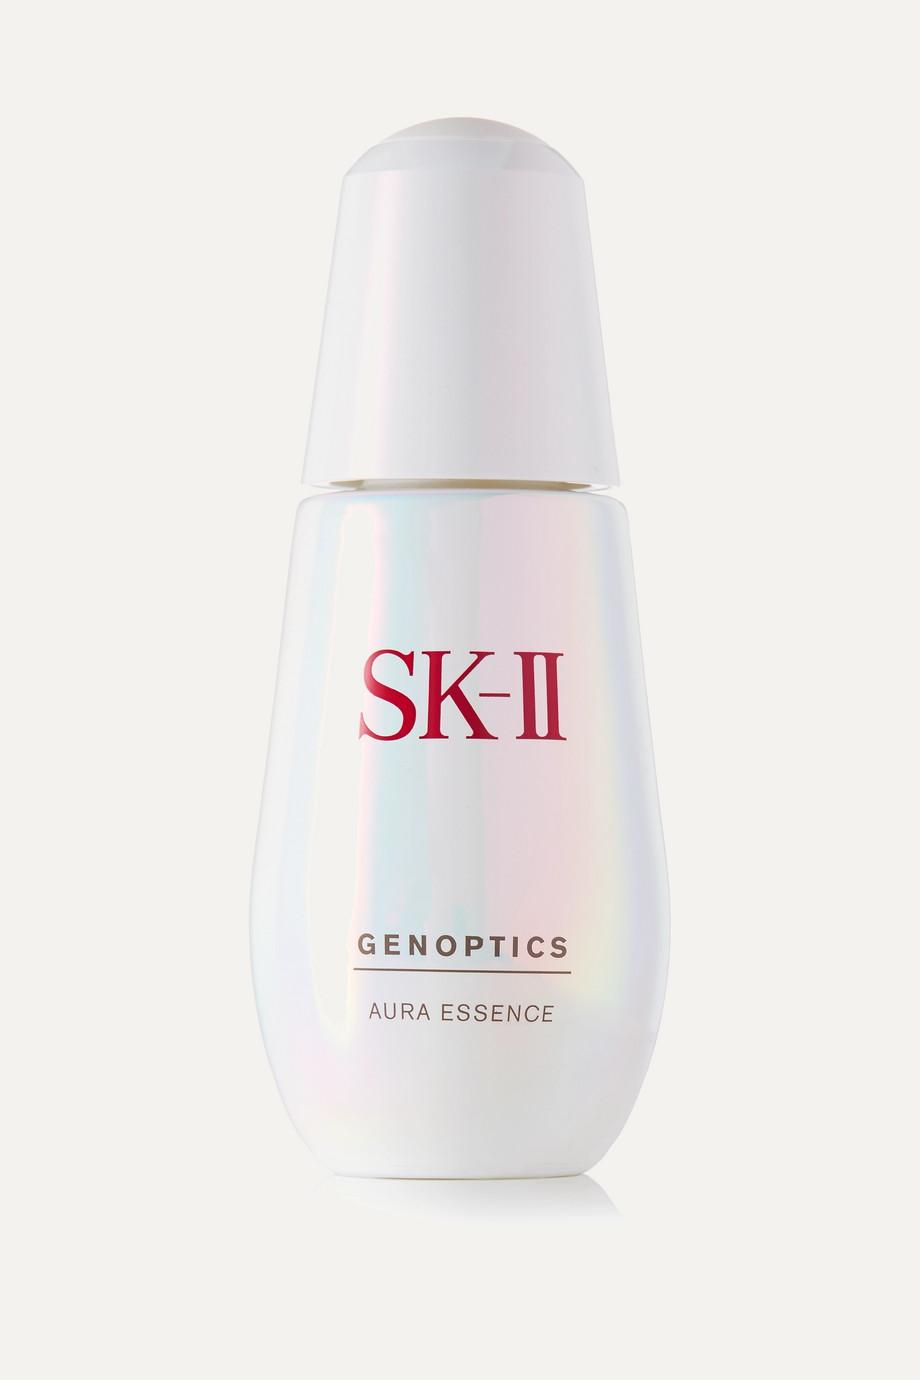 SK-II Sérum GenOptics Aura Essence, 50 ml